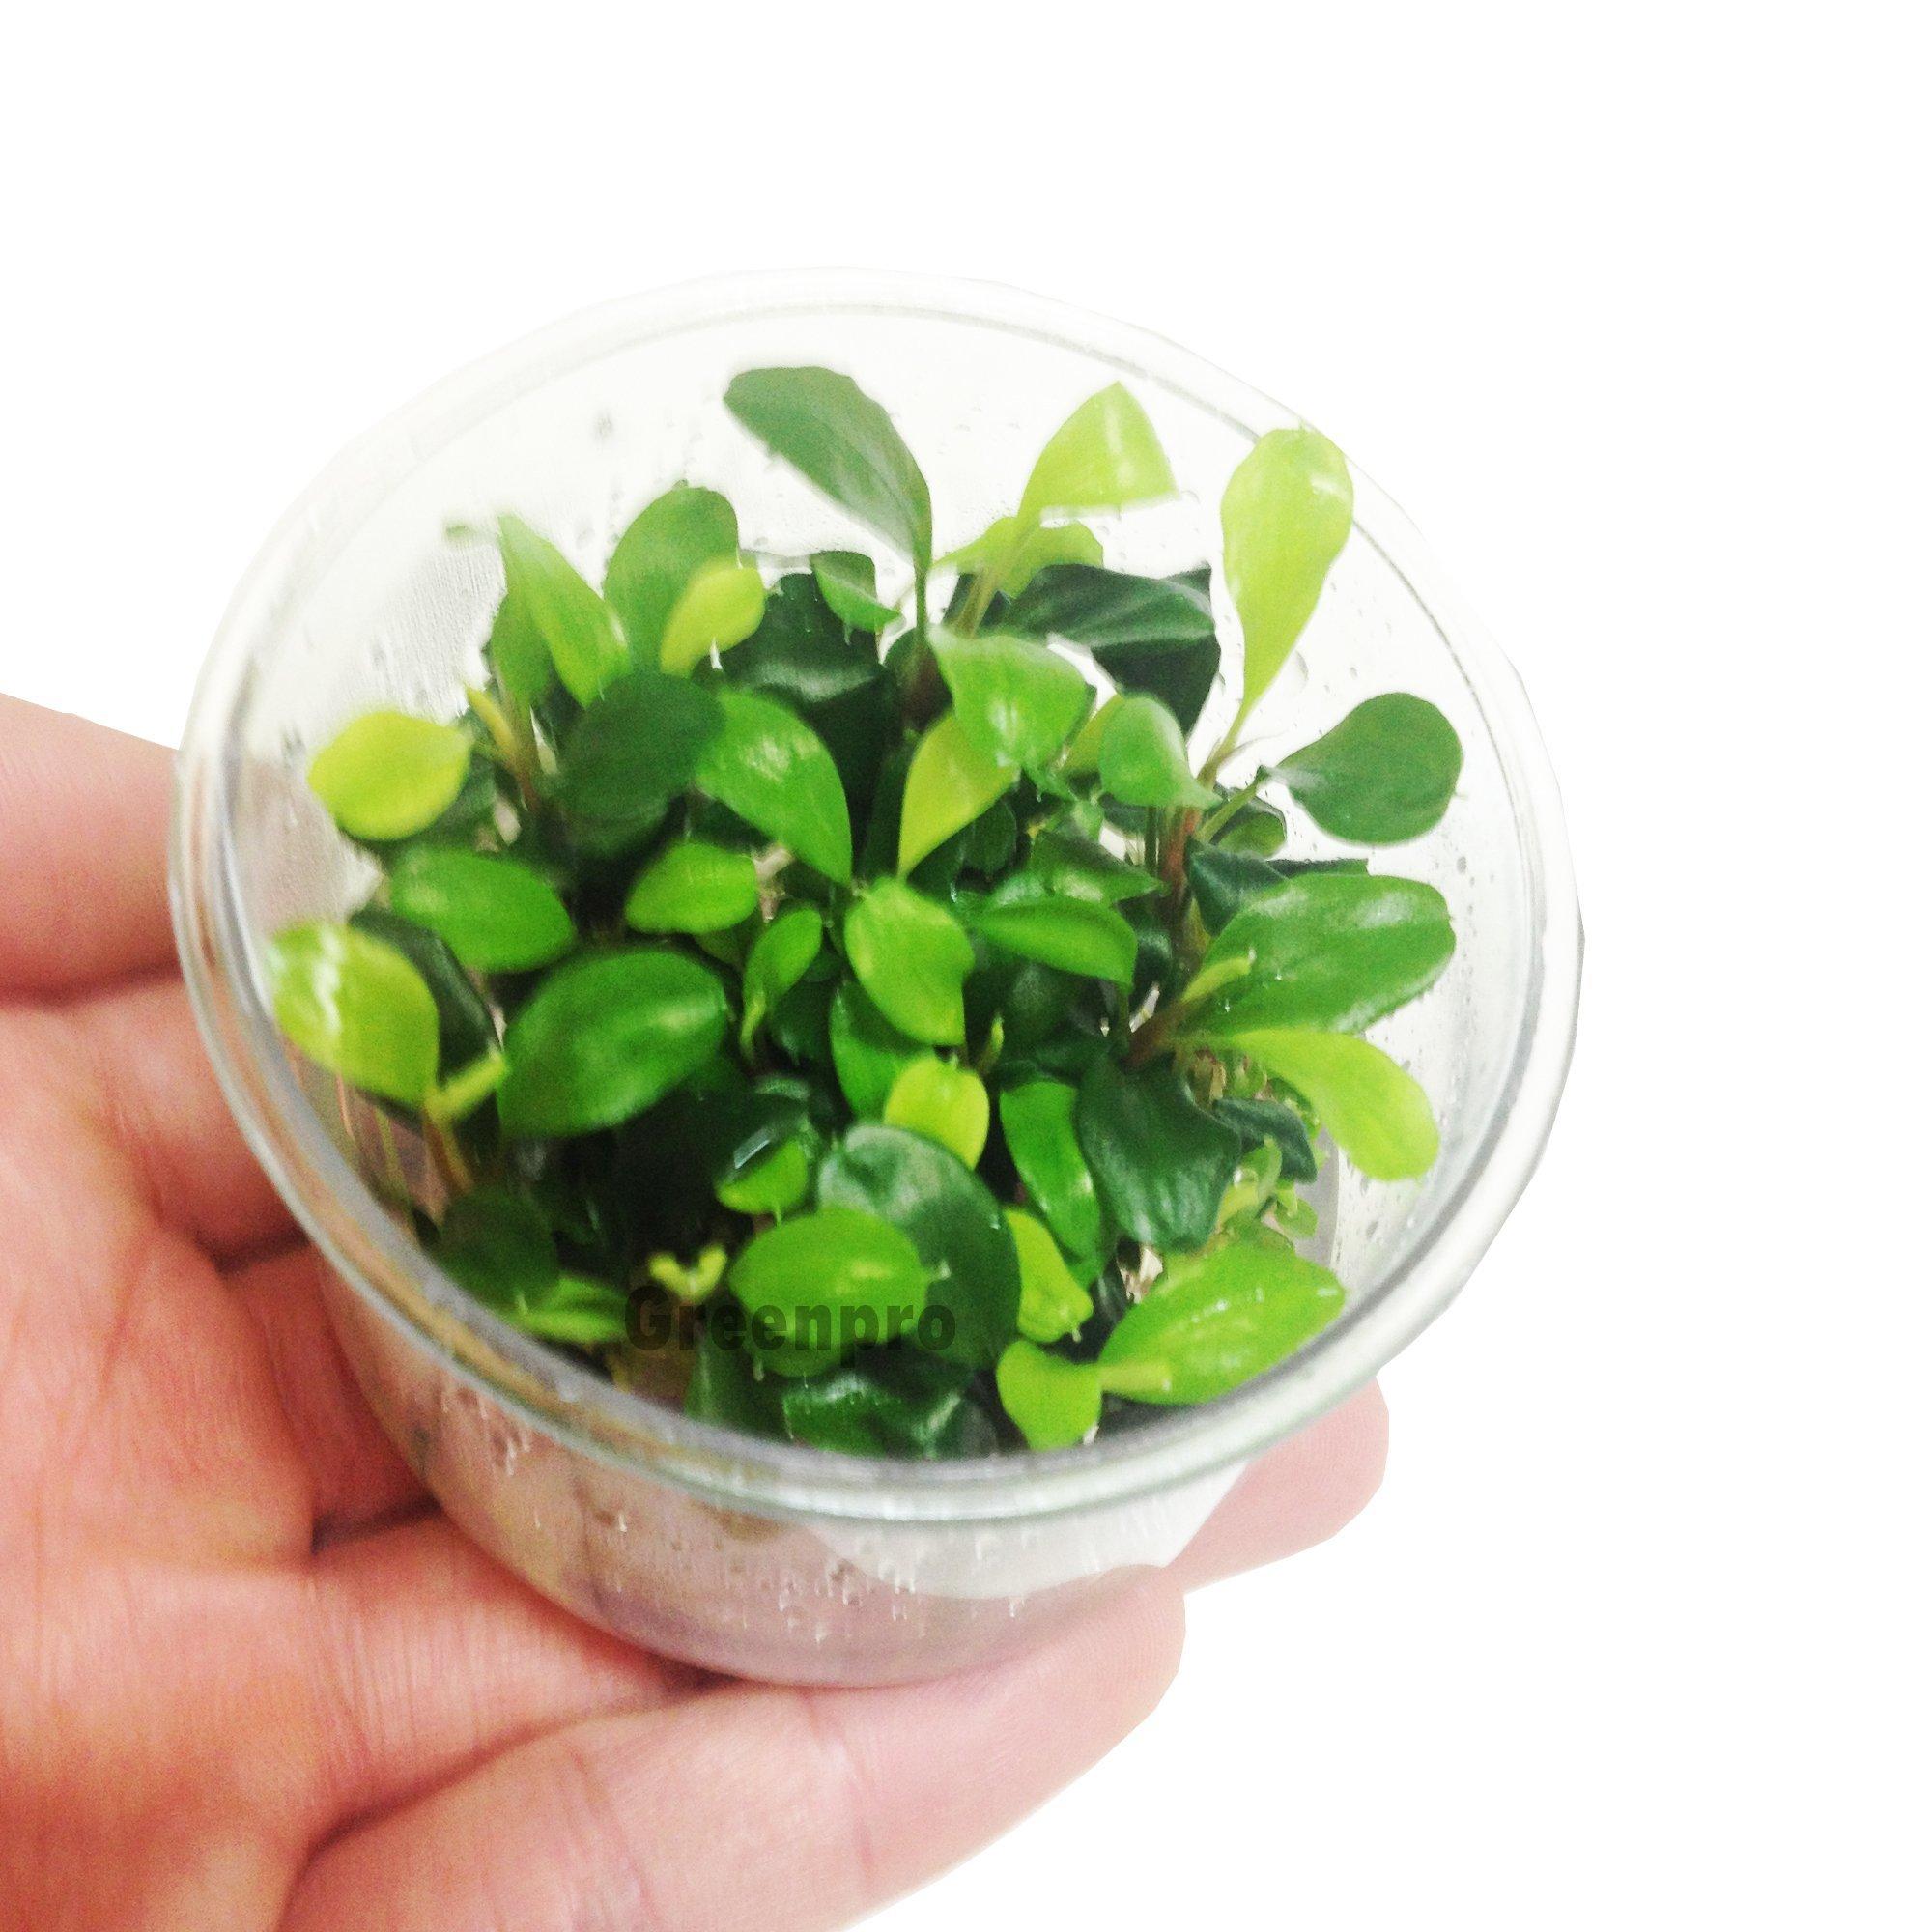 Bucephalandra Green Wavy Leaf Freshwater Live Aquarium Plant for Fish Tank by Greenpro